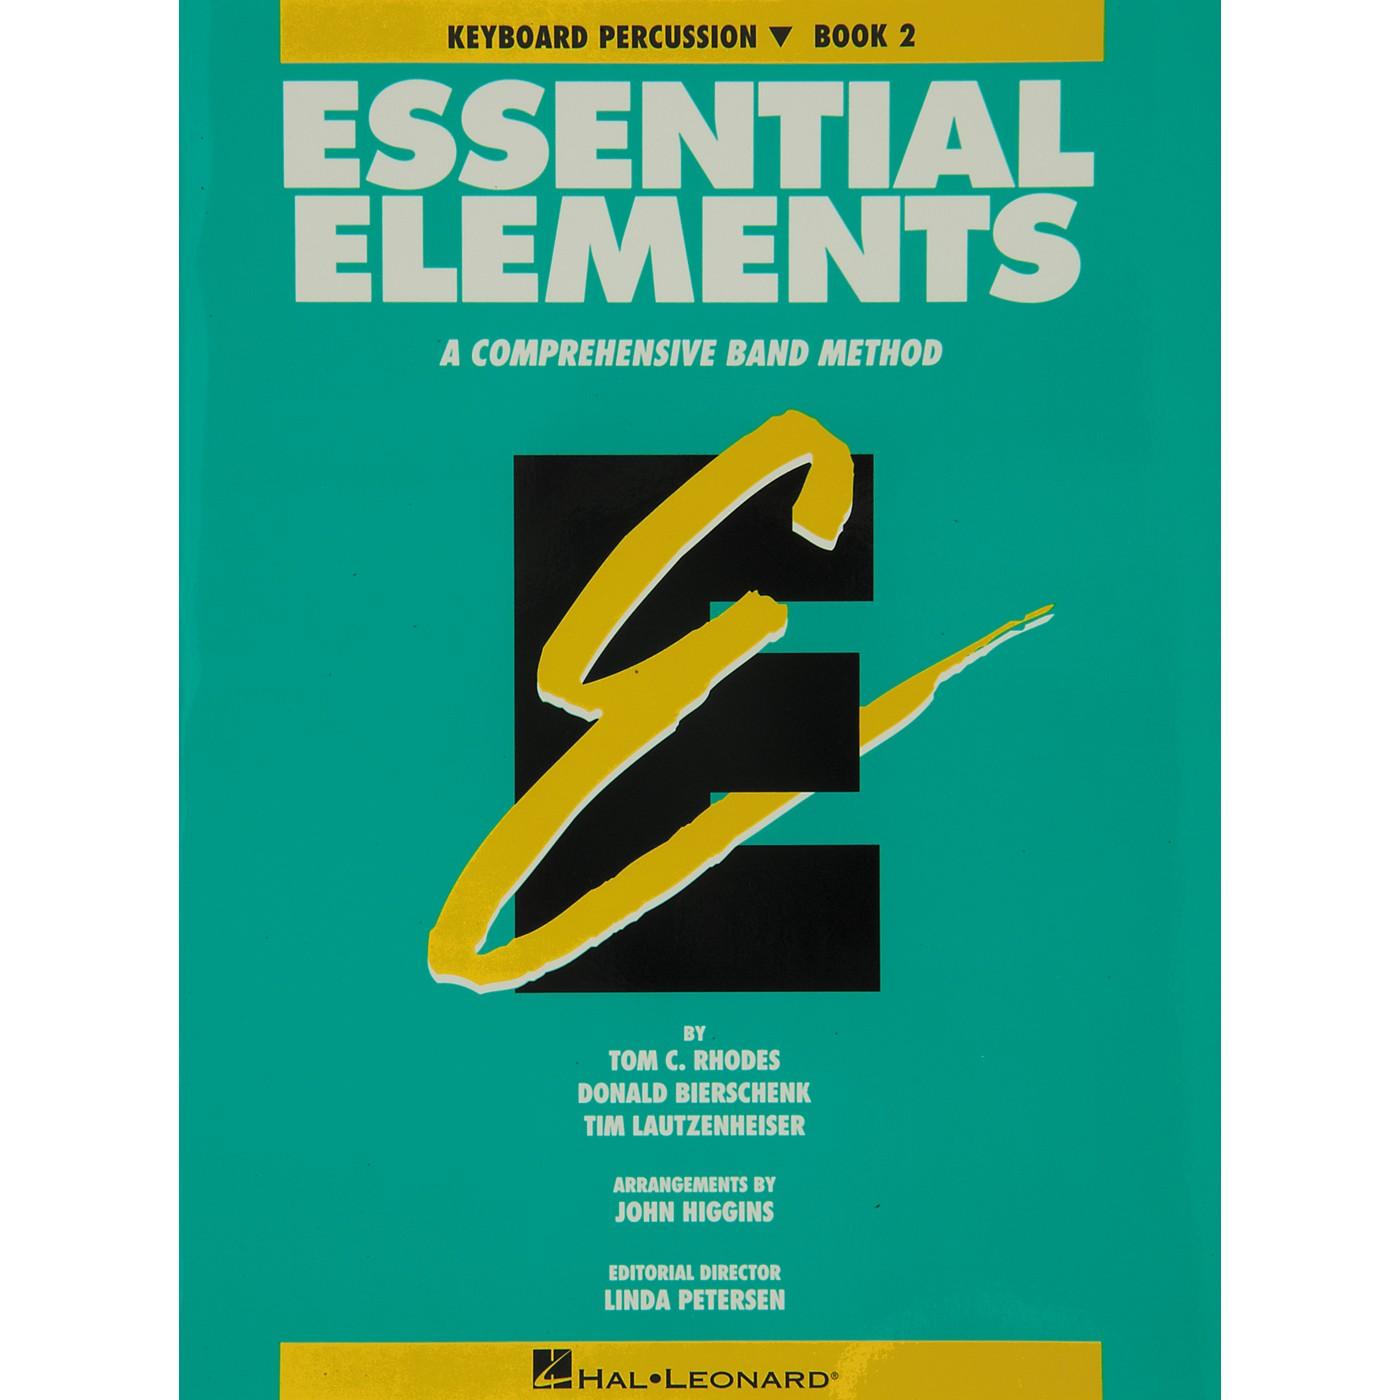 Hal Leonard Essential Elements Book 2 Keyboard Percussion thumbnail